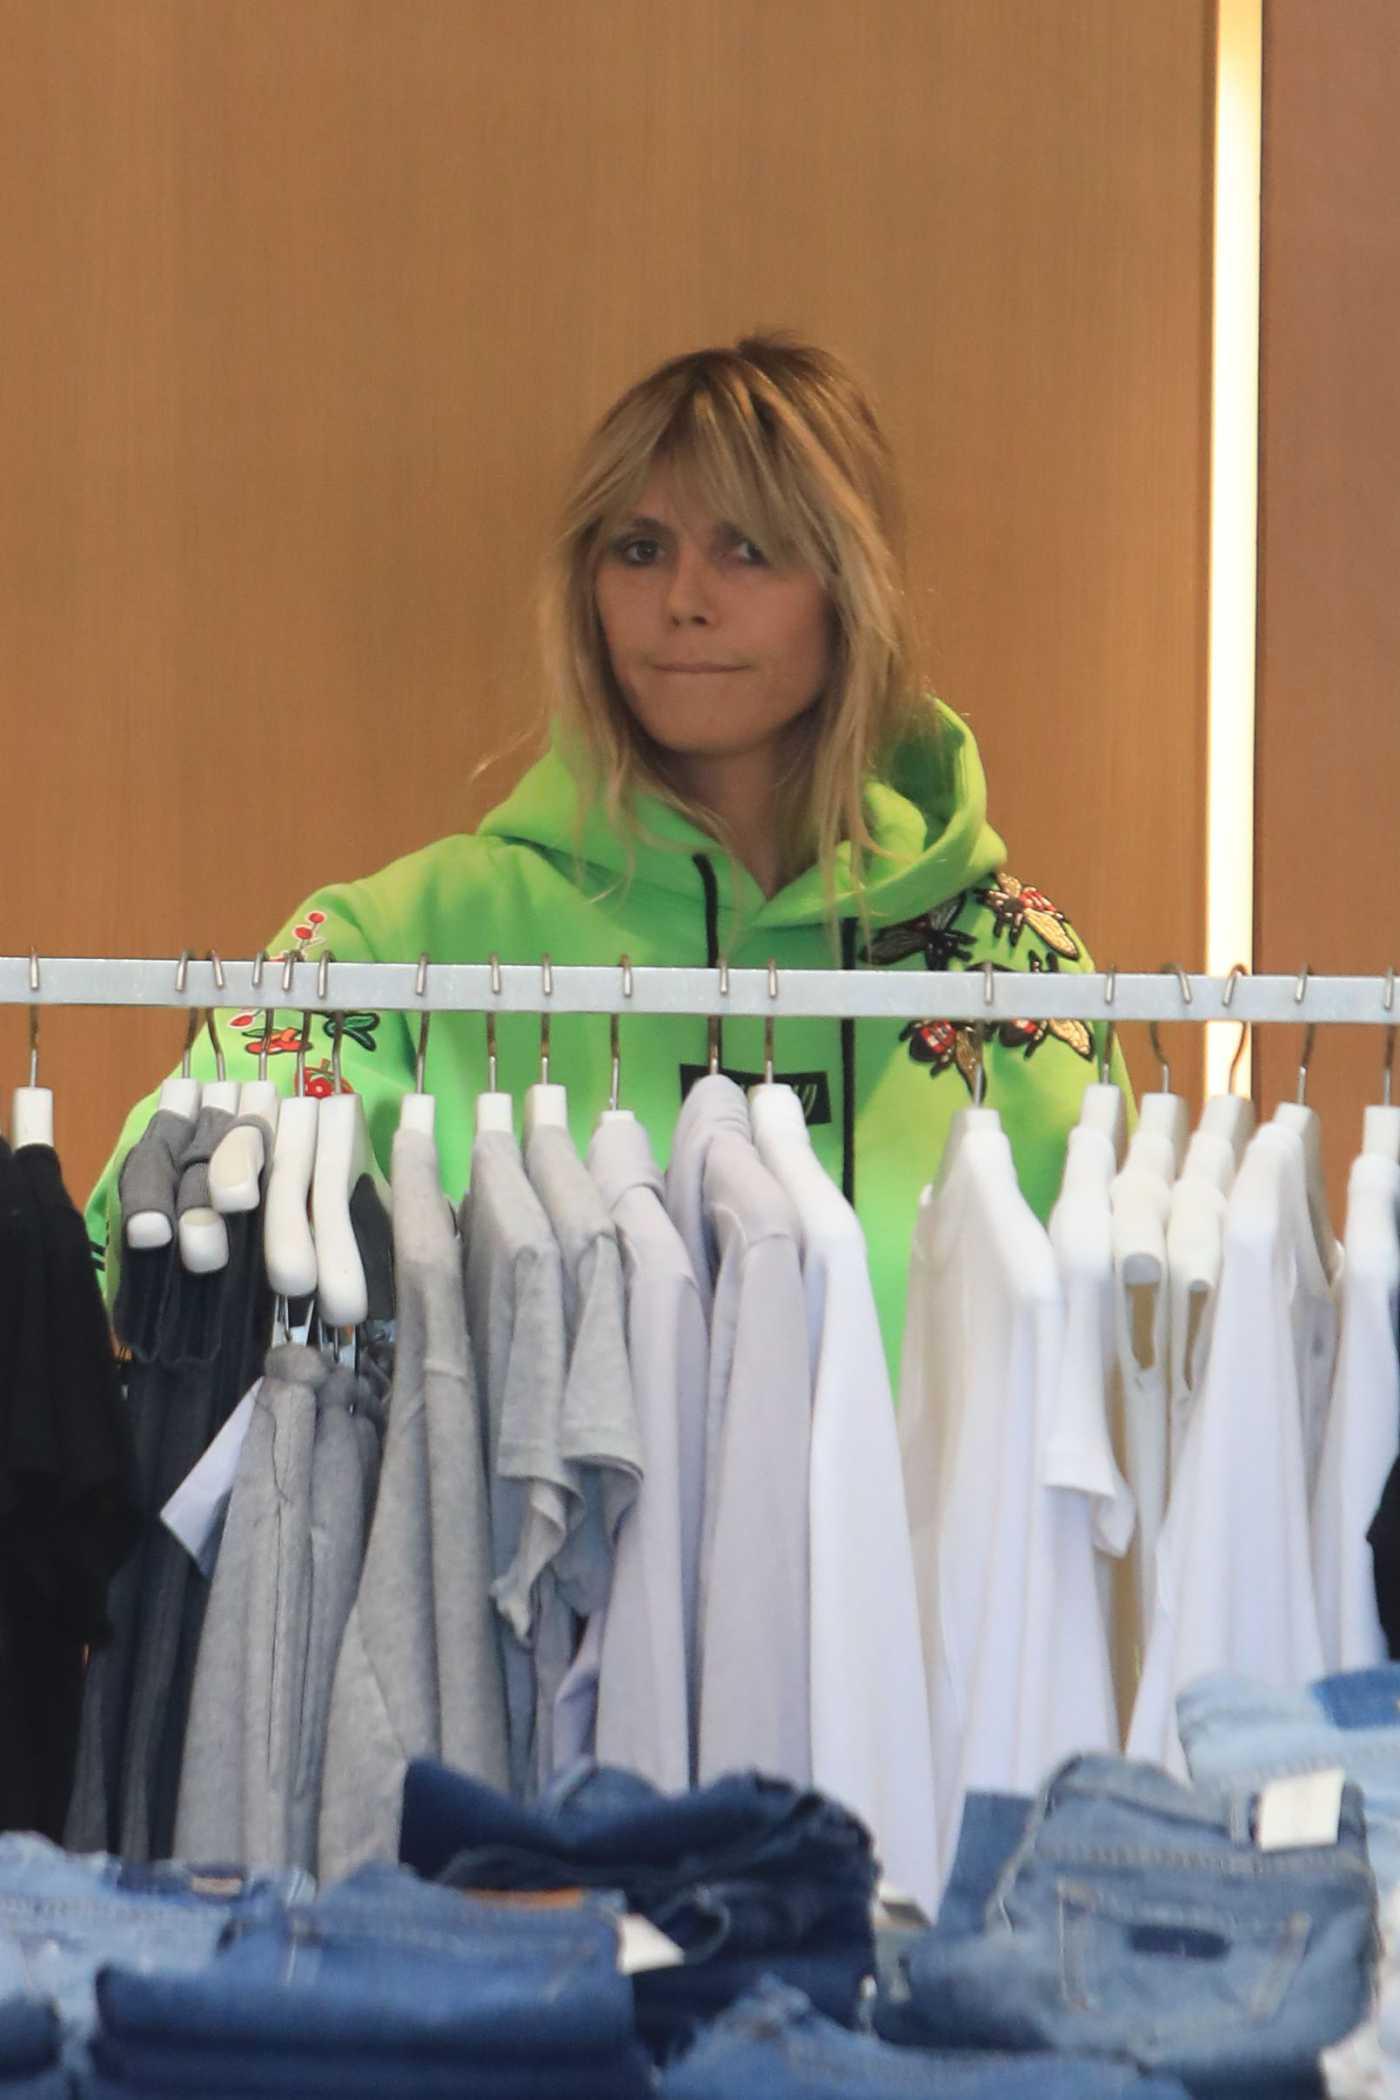 Heidi Klum in a Green Hoody Goes Shopping in Los Angeles 02/01/2020